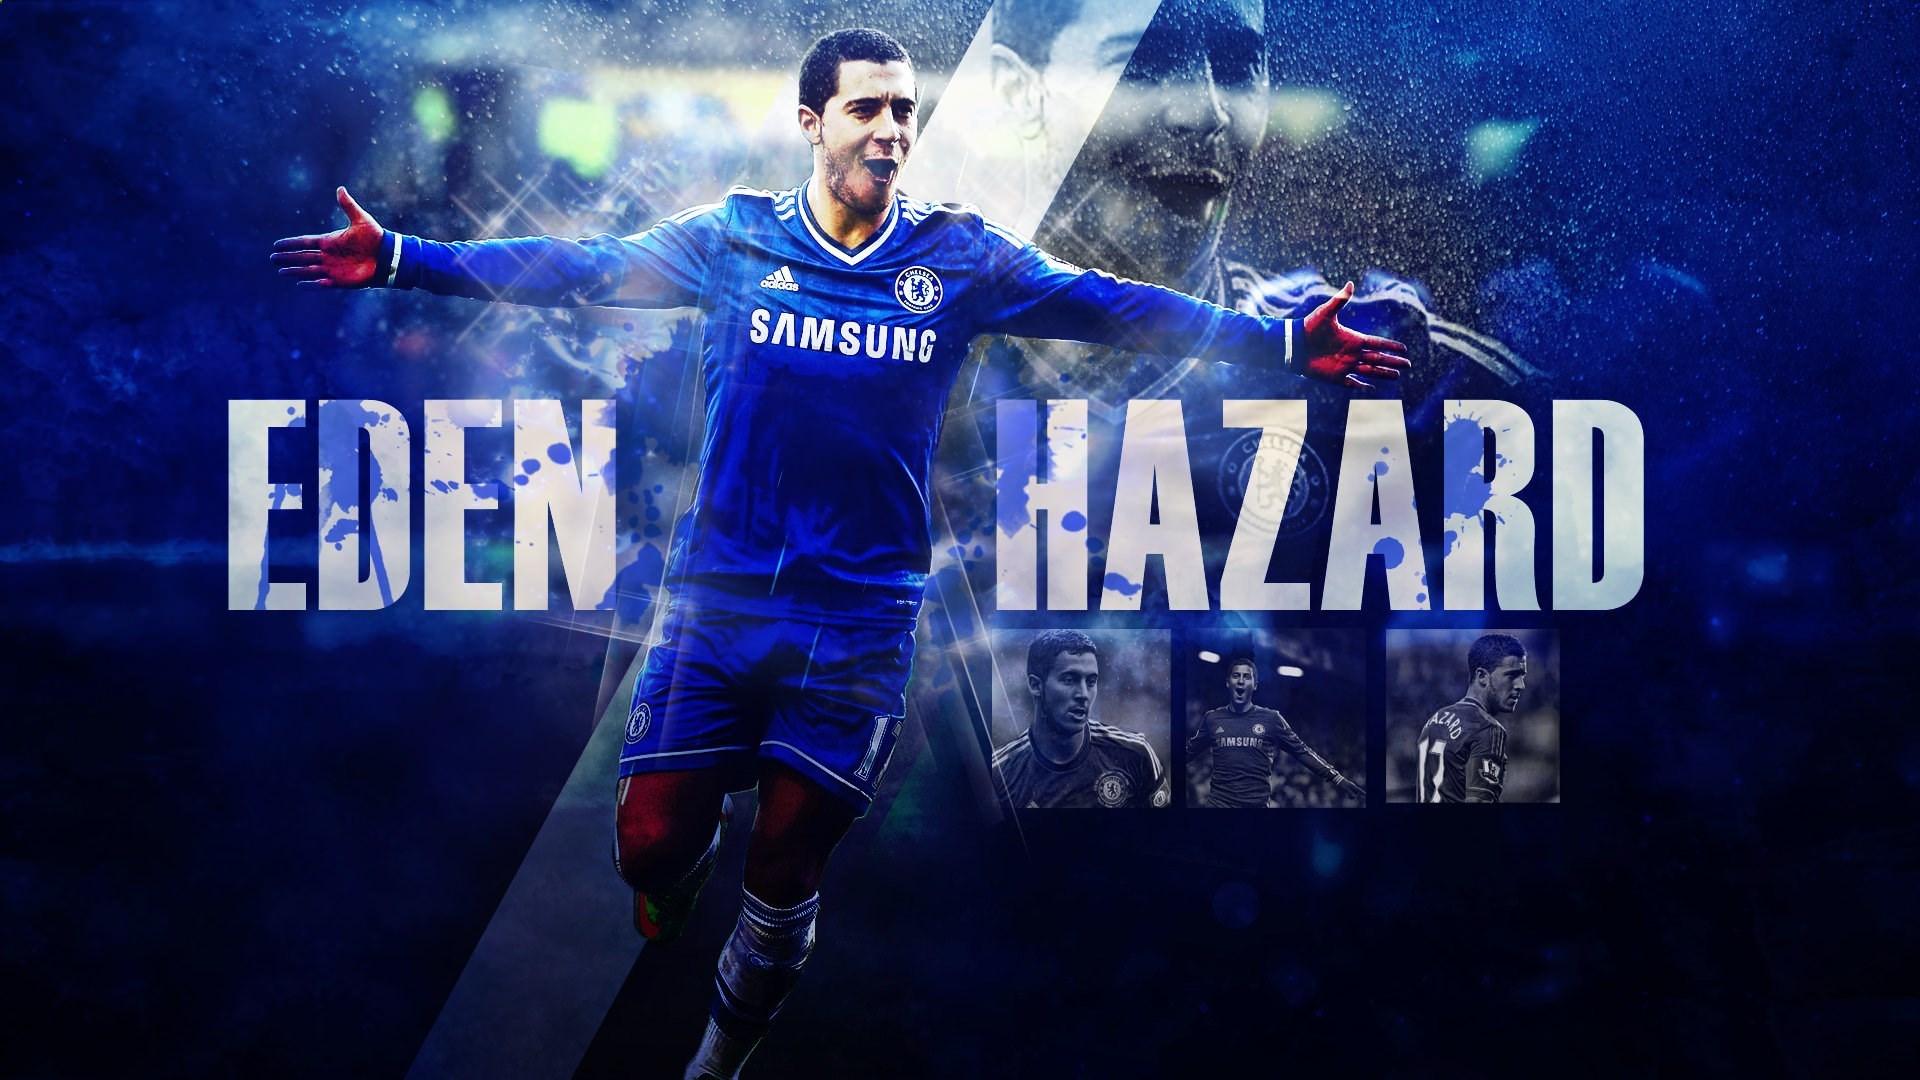 Eden-Michael-Hazard-is-a-Belgian-professional-footballer-who-plays-for-Chelsea-and-the-Belgium-natio-wallpaper-wpc9004635